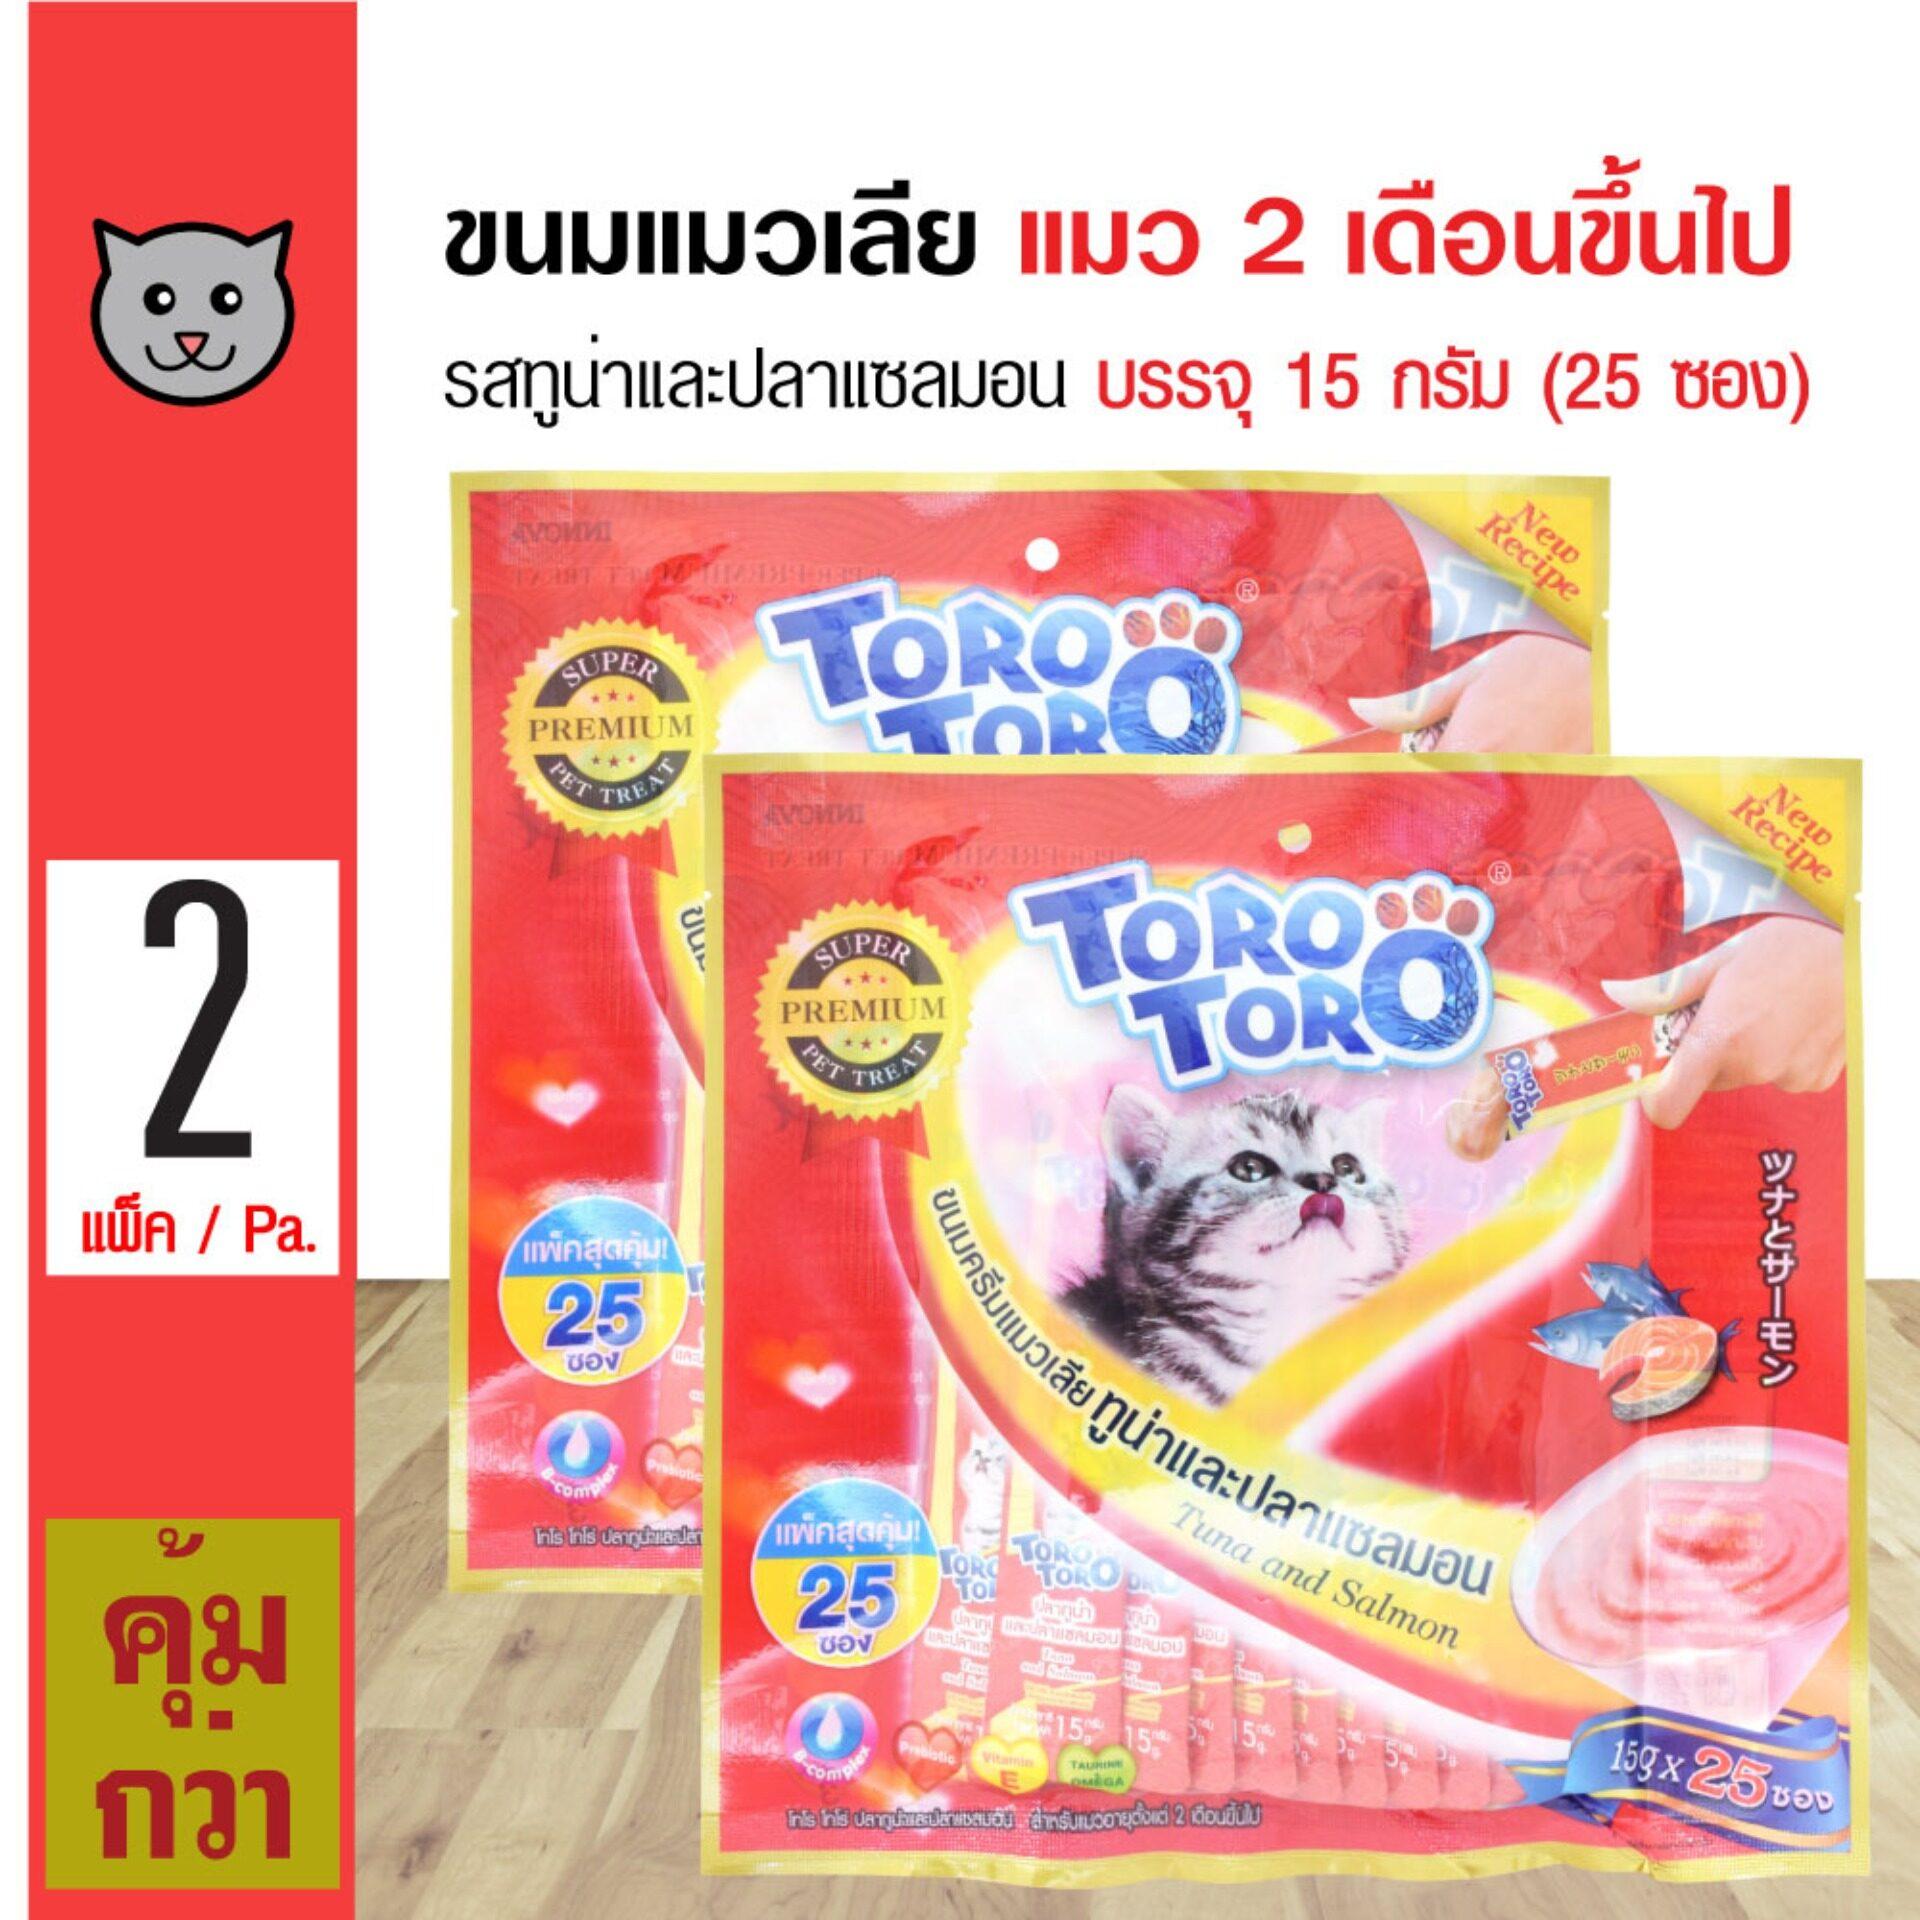 Toro Toro ขนมแมวเลีย รสทูน่าและปลาแซลมอน สำหรับแมว 2 เดือนขึ้นไป (25 ซอง/แพ็ค) X 2 แพ็ค.